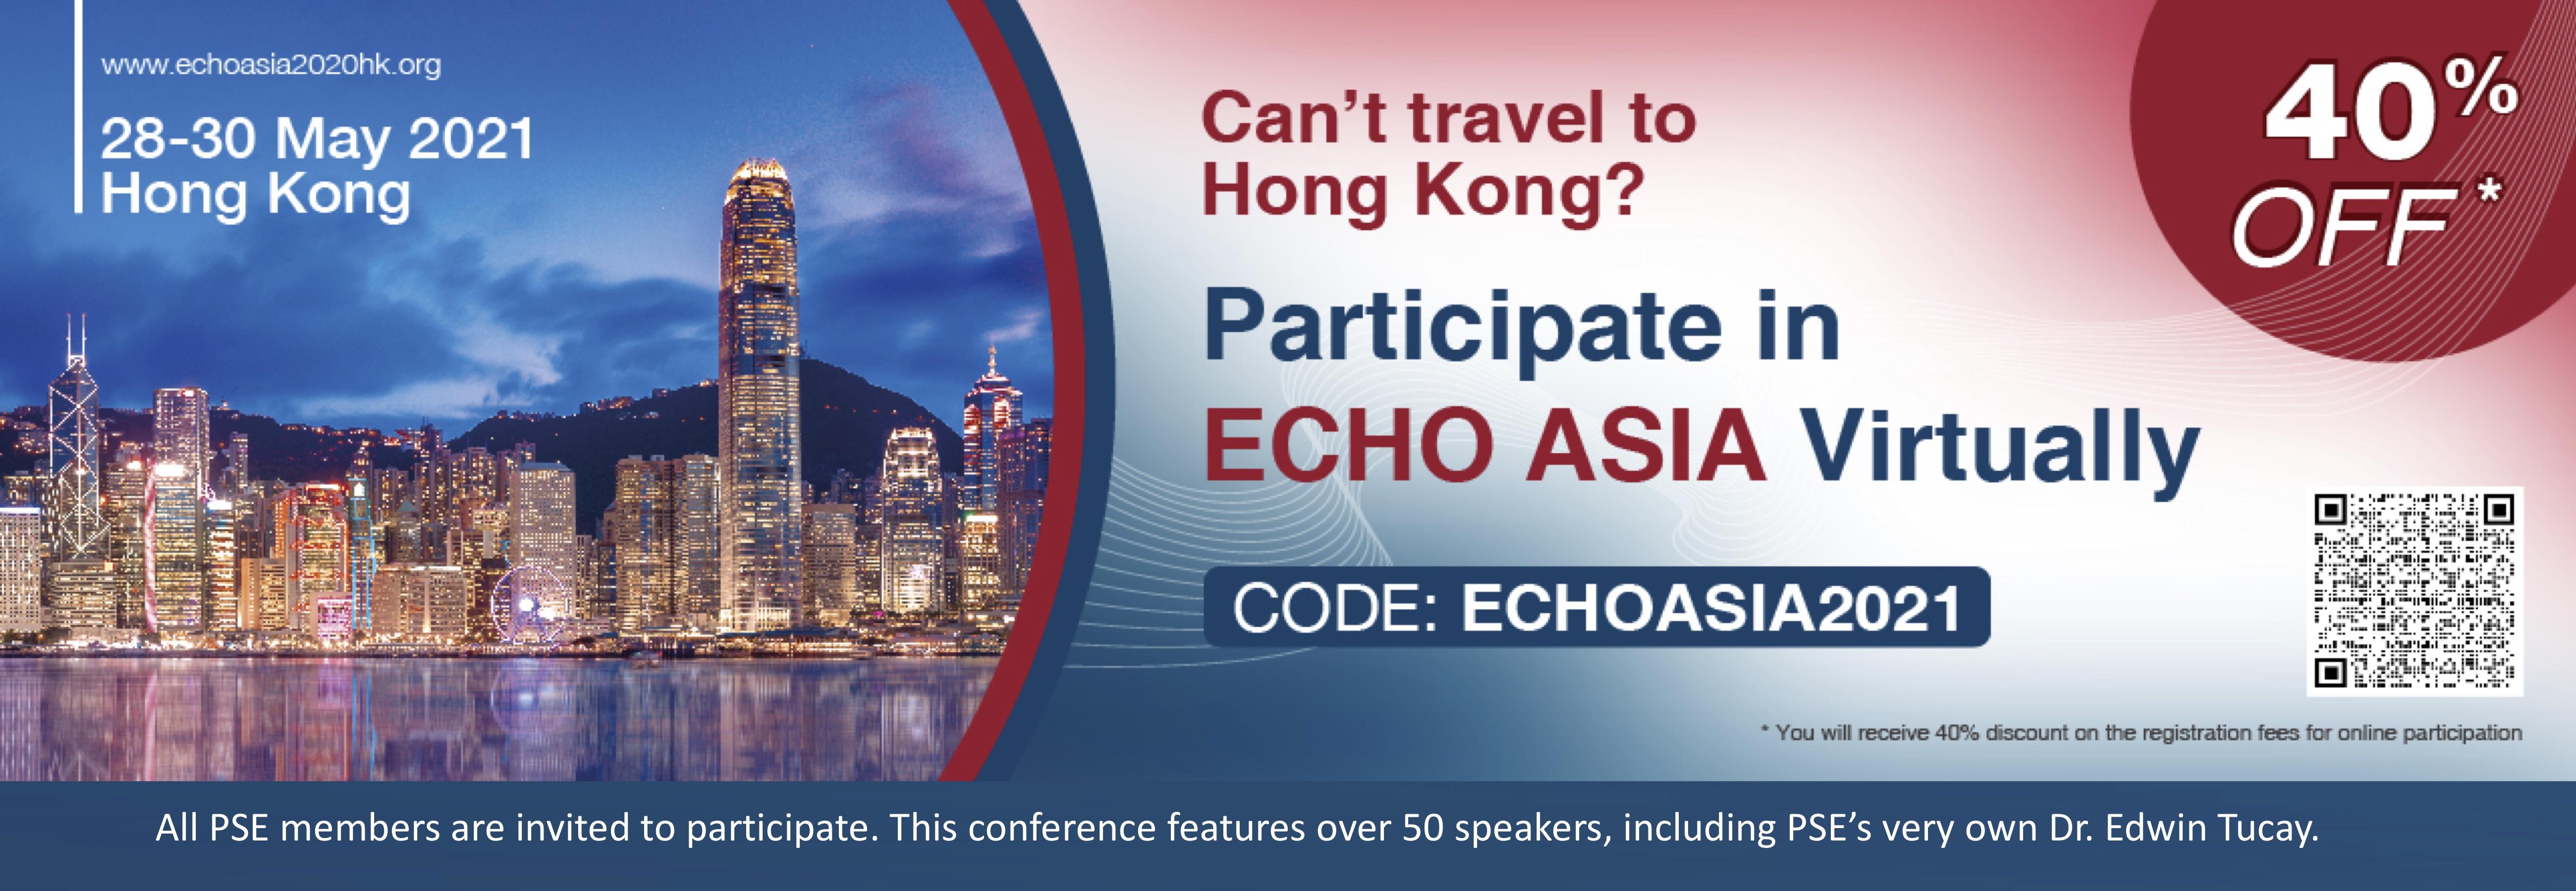 Echo_Asia_2021